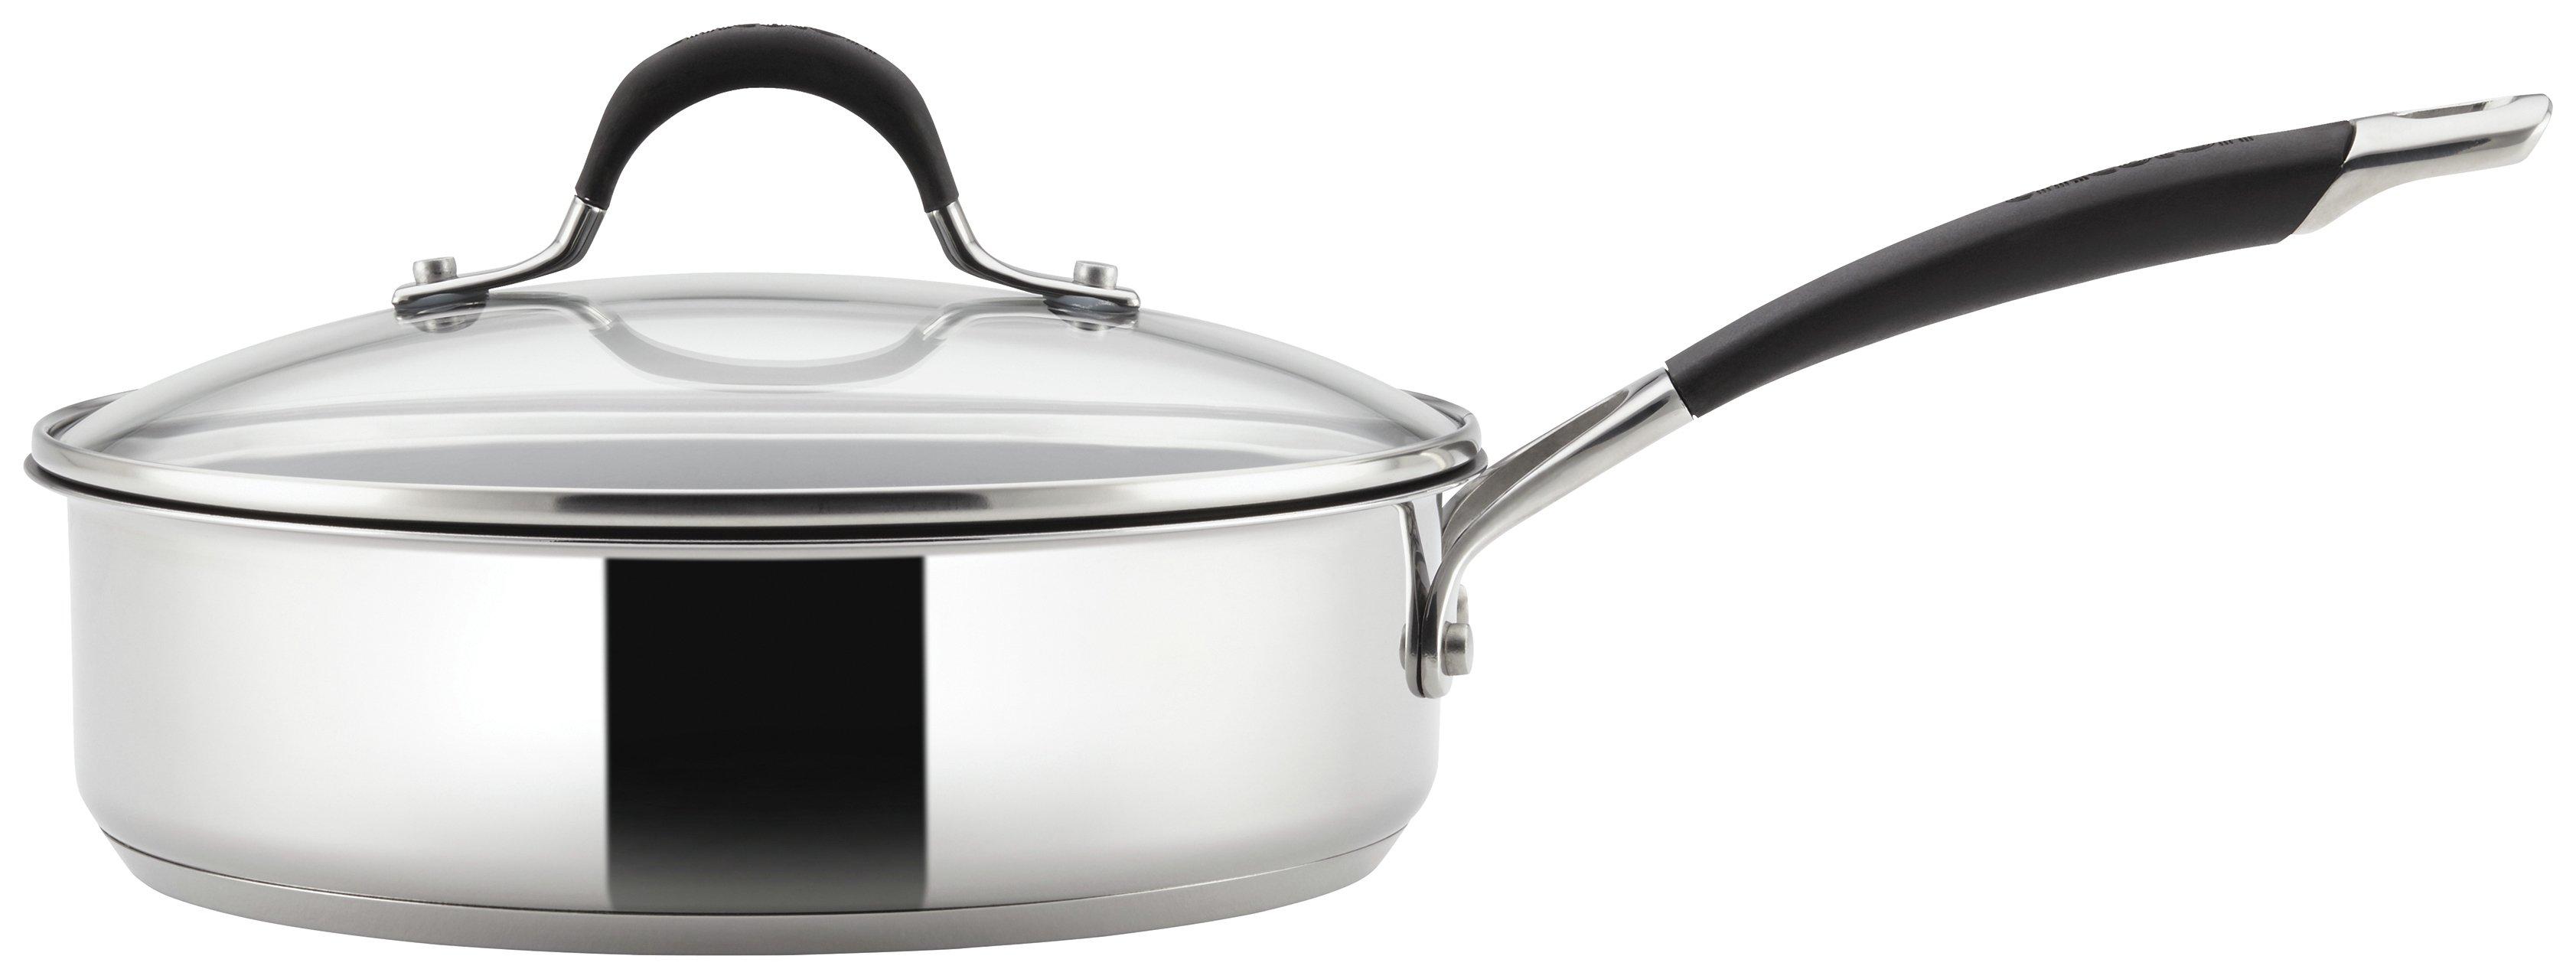 Image of Circulon Momentum 24cm Covered Saute Pan